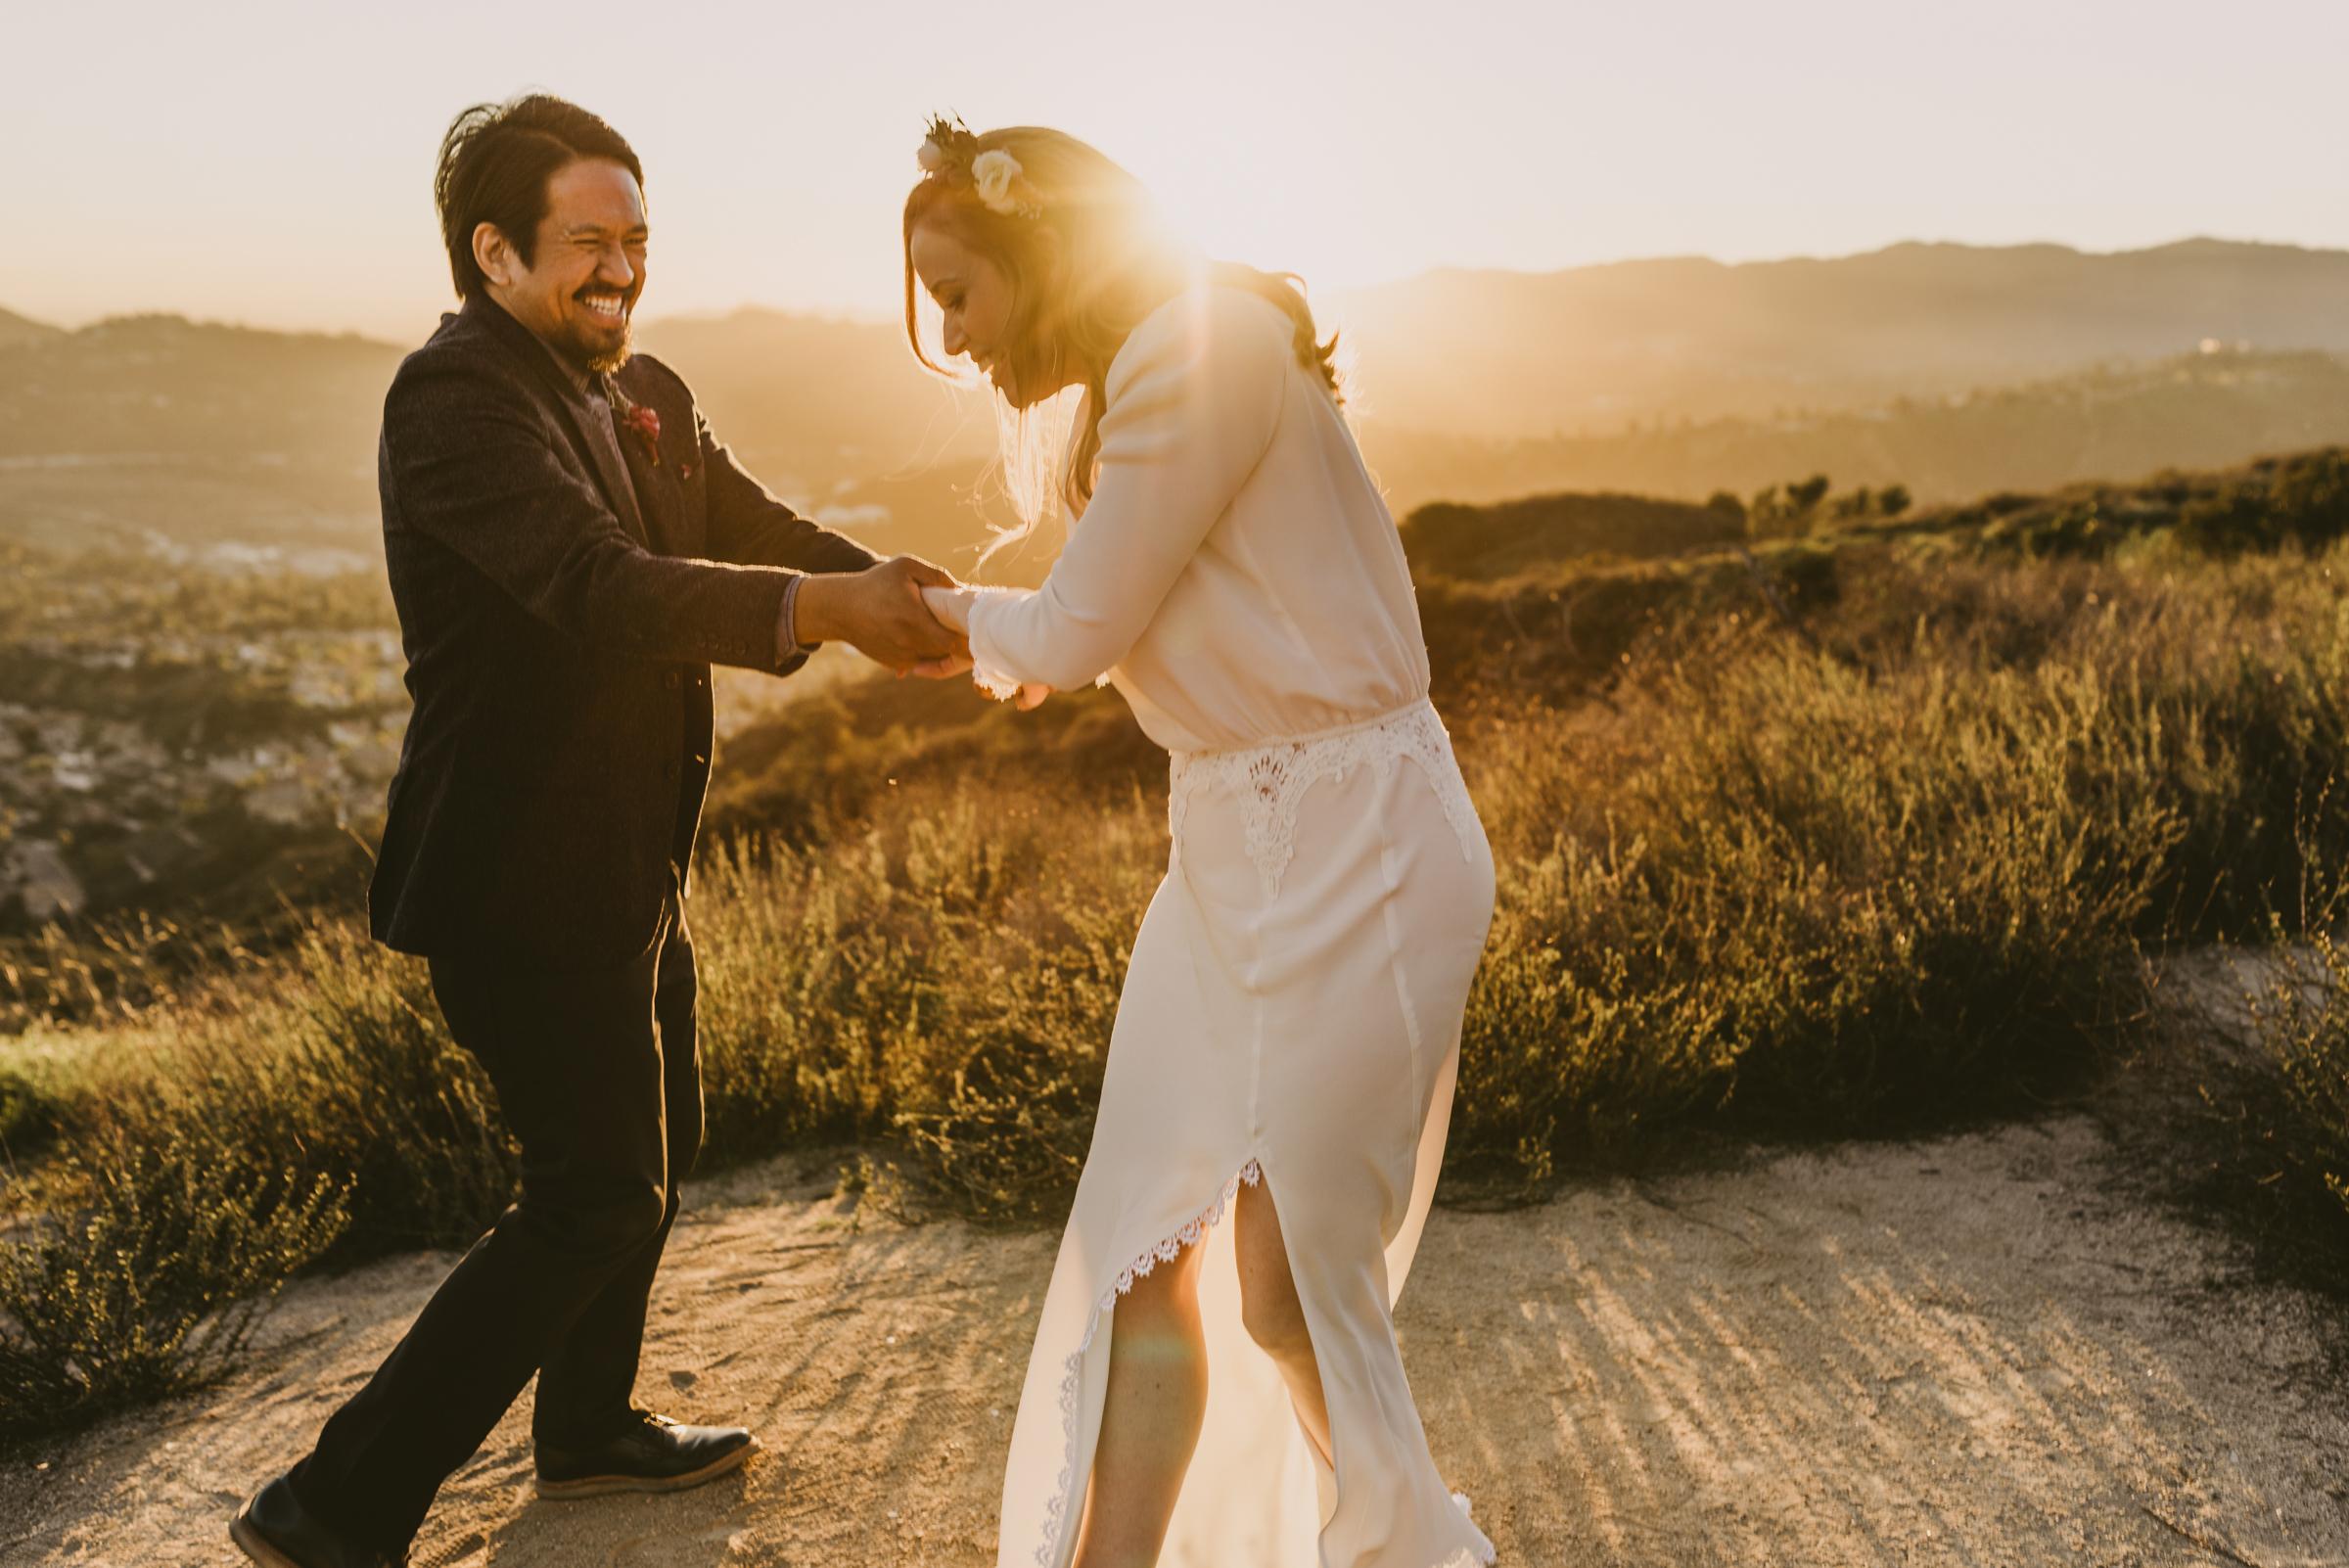 ©Isaiah + Taylor Photography - Intimate Elopement, Eaton Canyon, Los Angeles Wedding Photographer-80.jpg